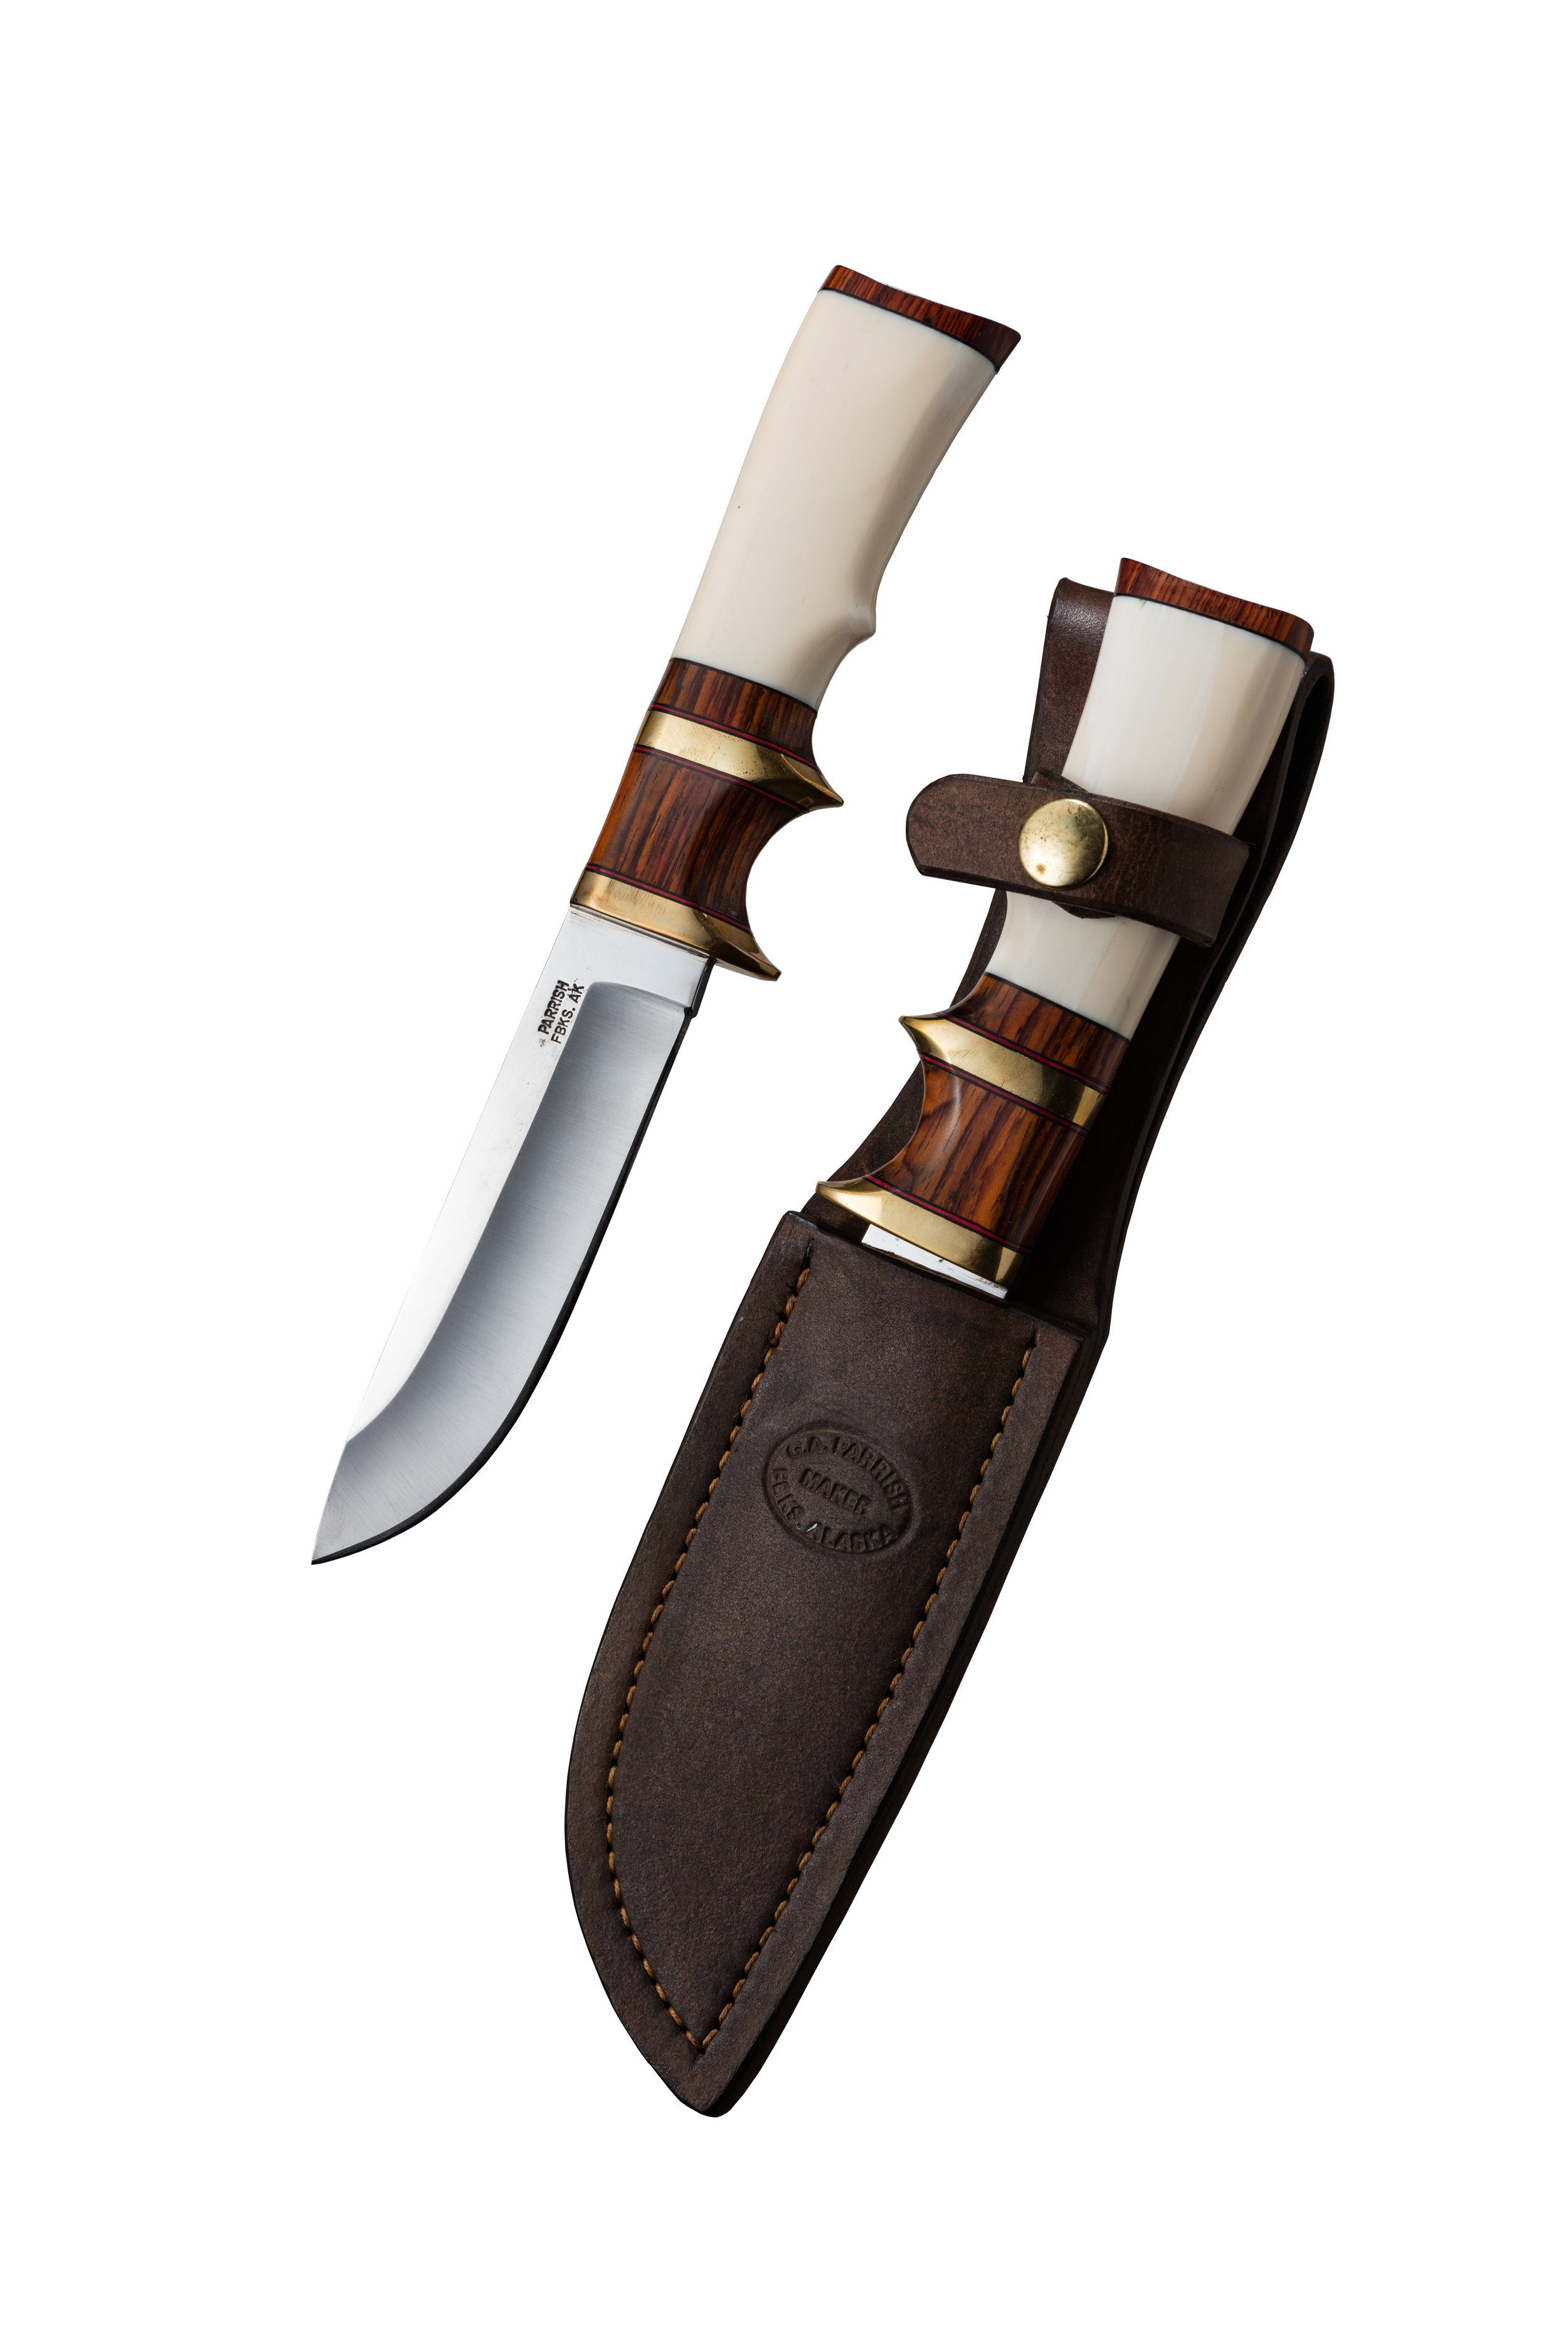 (003 of 006) - Knives (3 of 6).jpg